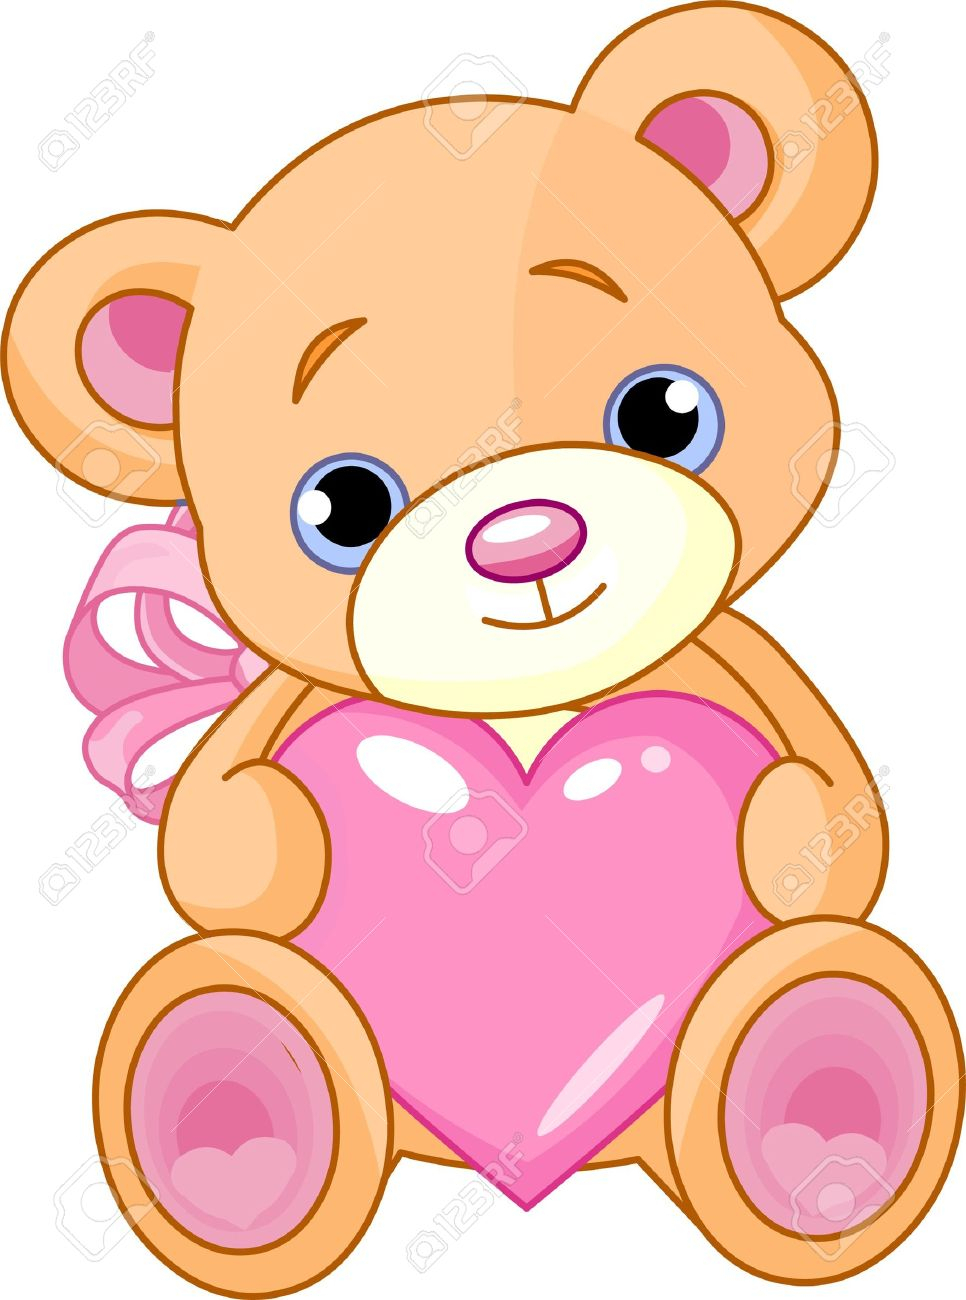 966x1300 Teddy Bear Drawing Clipart